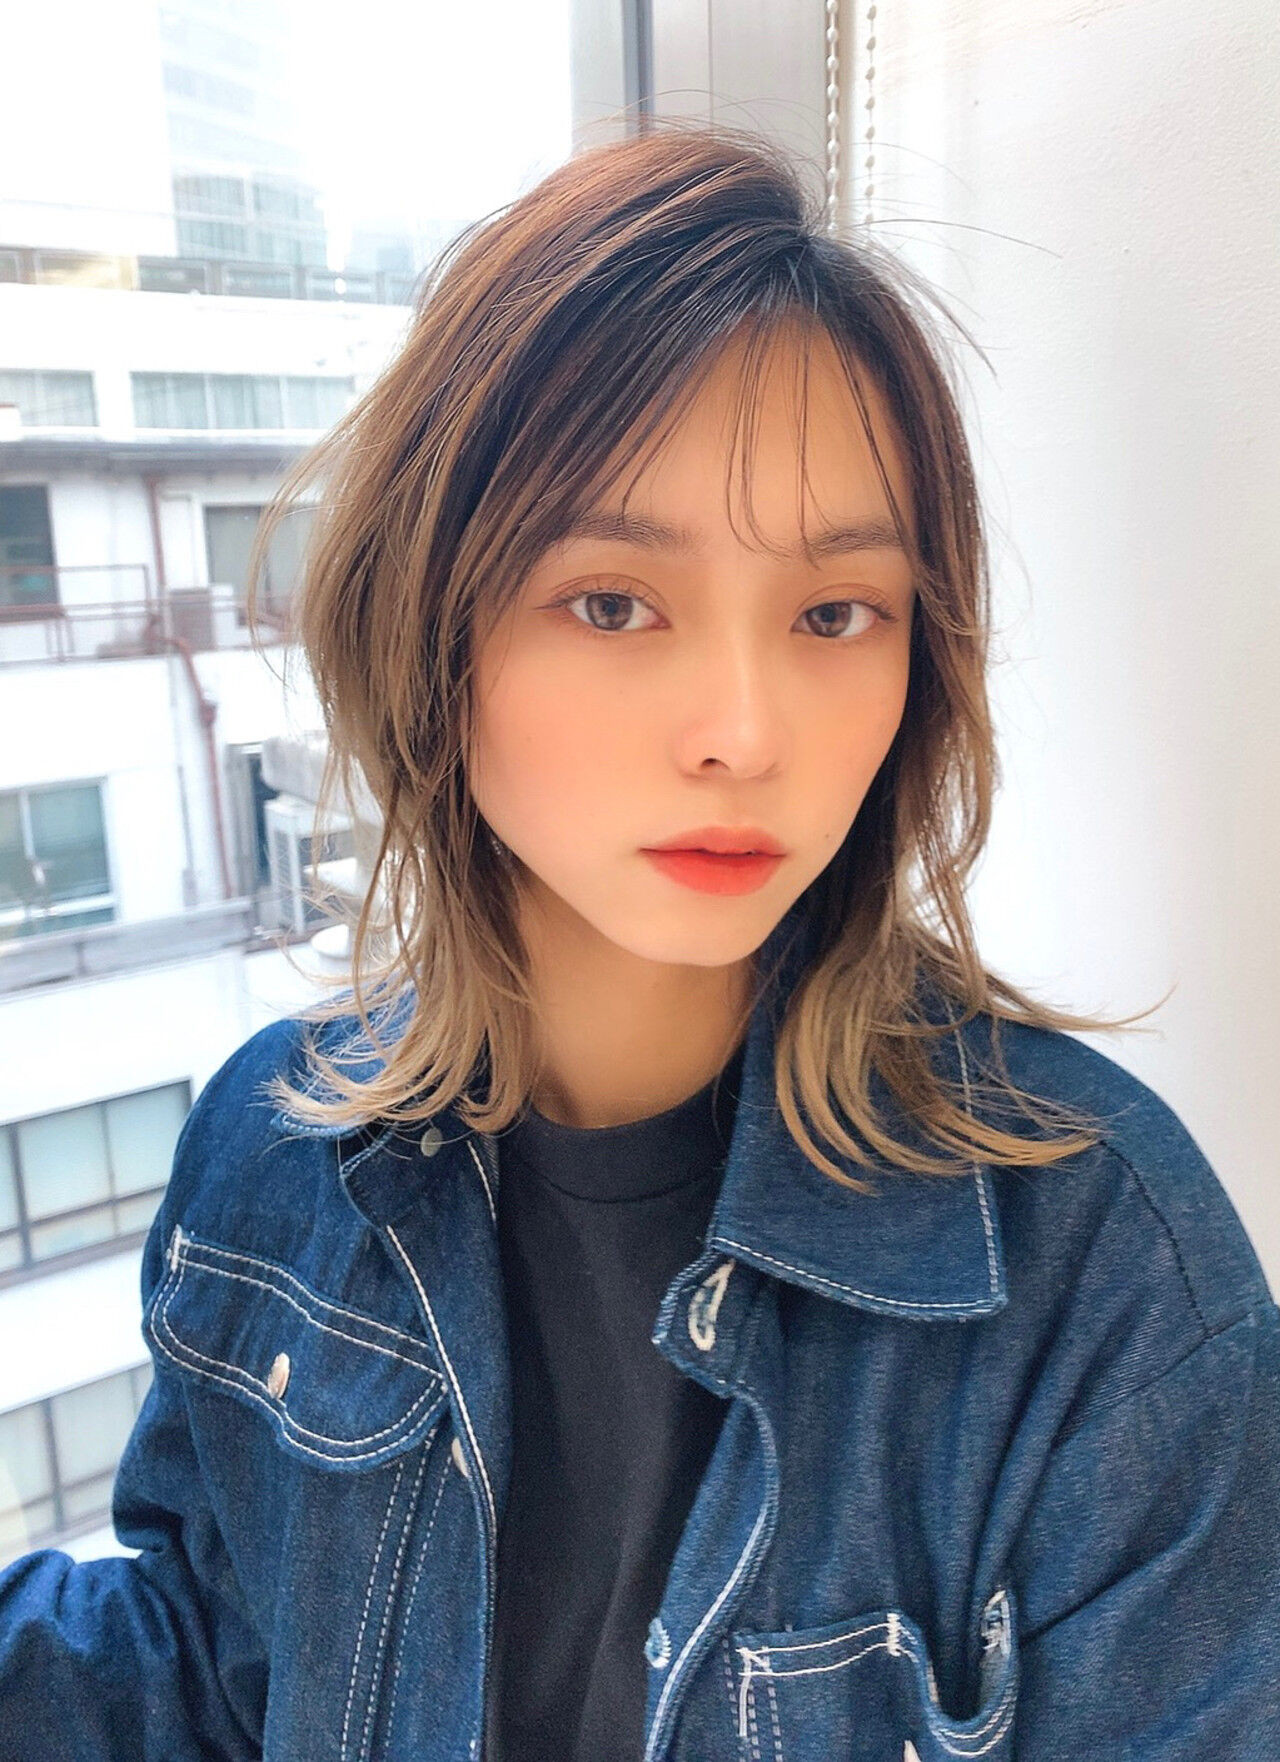 Euphoria GINZA 畑 俊太朗/Euphoria Ginza